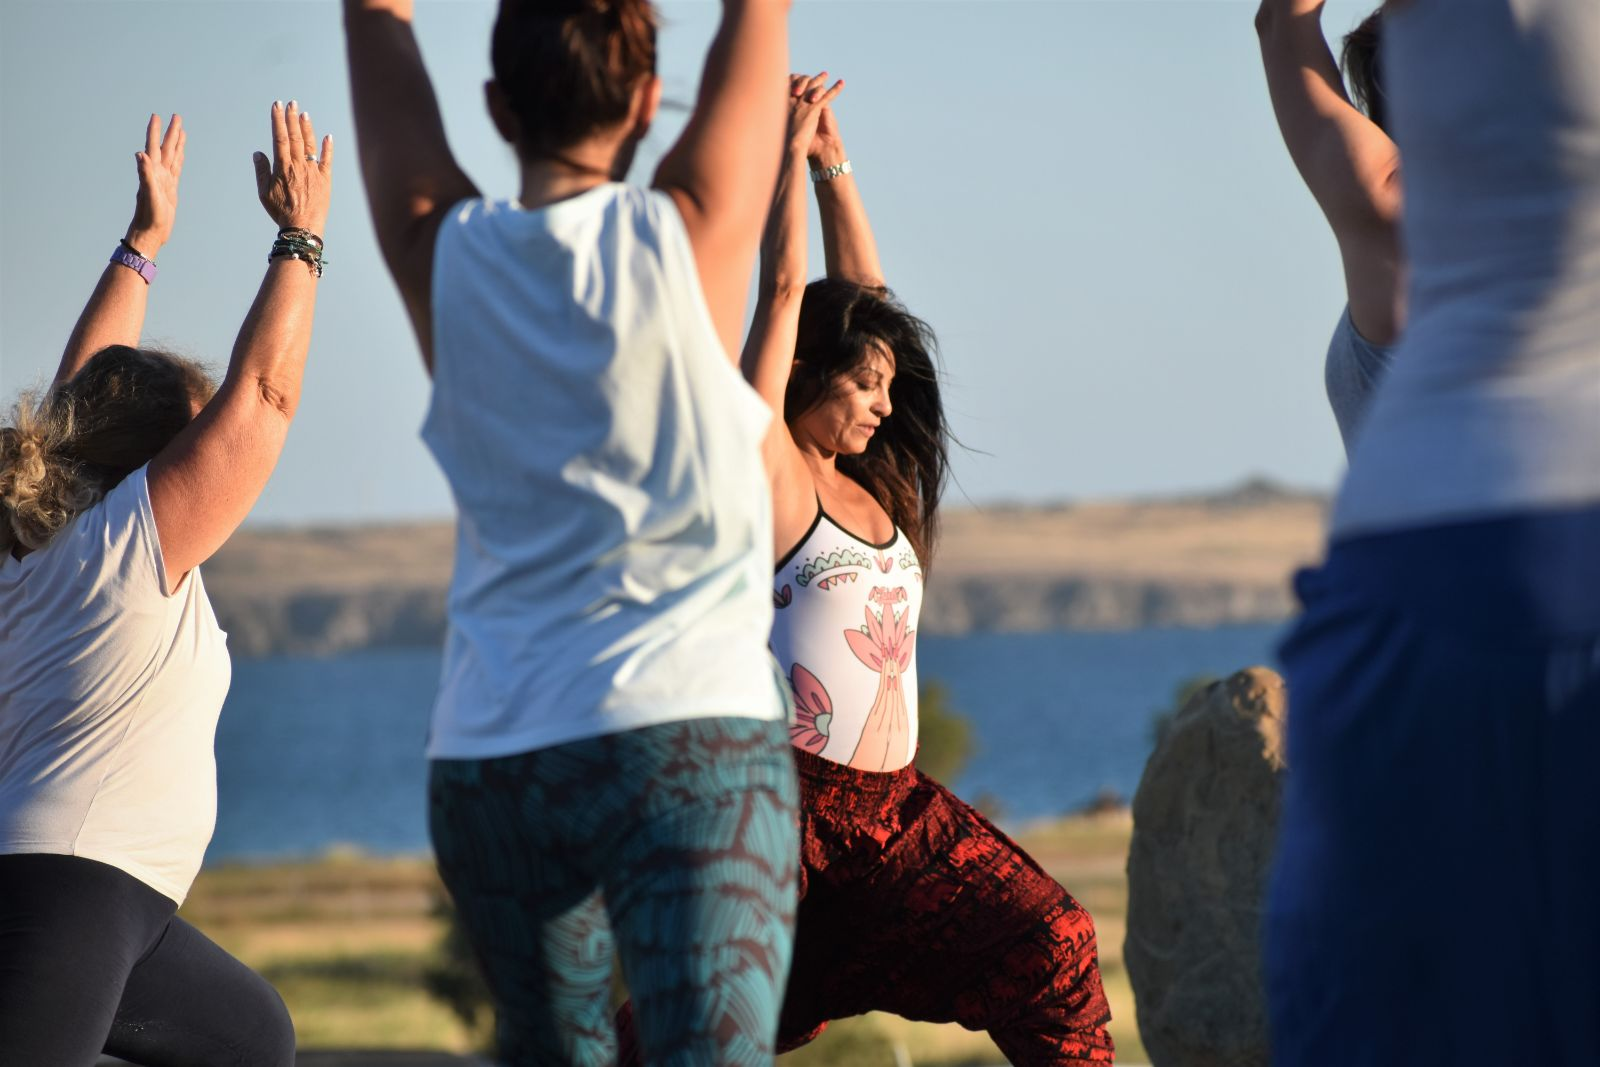 Yoga Retreat στην Λήμνο, ένα Νησί Έκπληξη